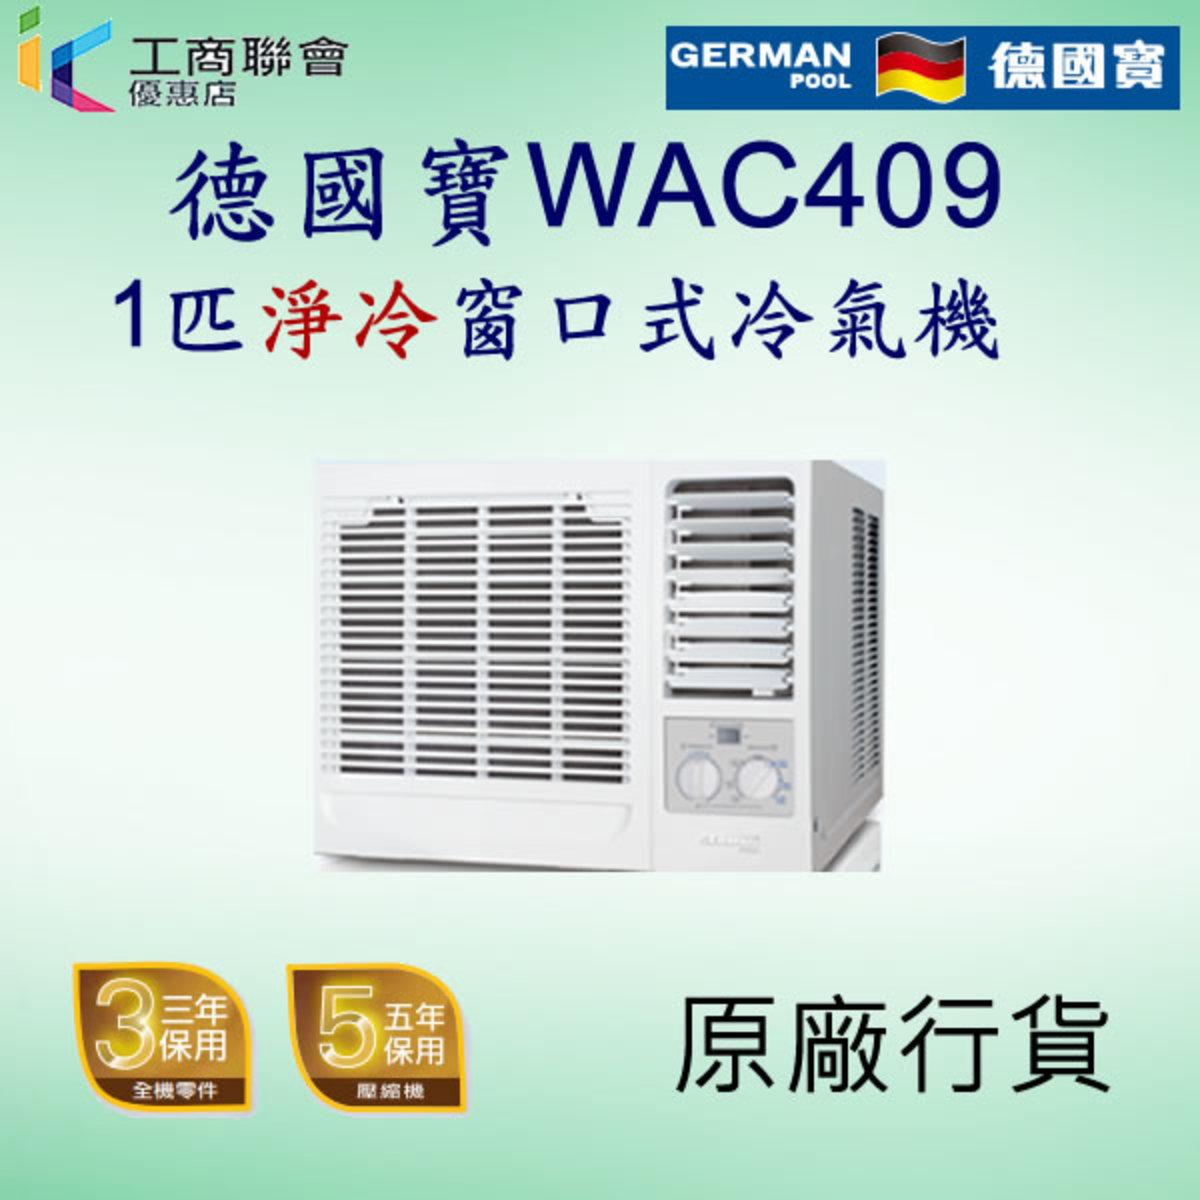 German Pool   WAC409   1匹淨冷窗口式冷氣機(免費除舊服務)